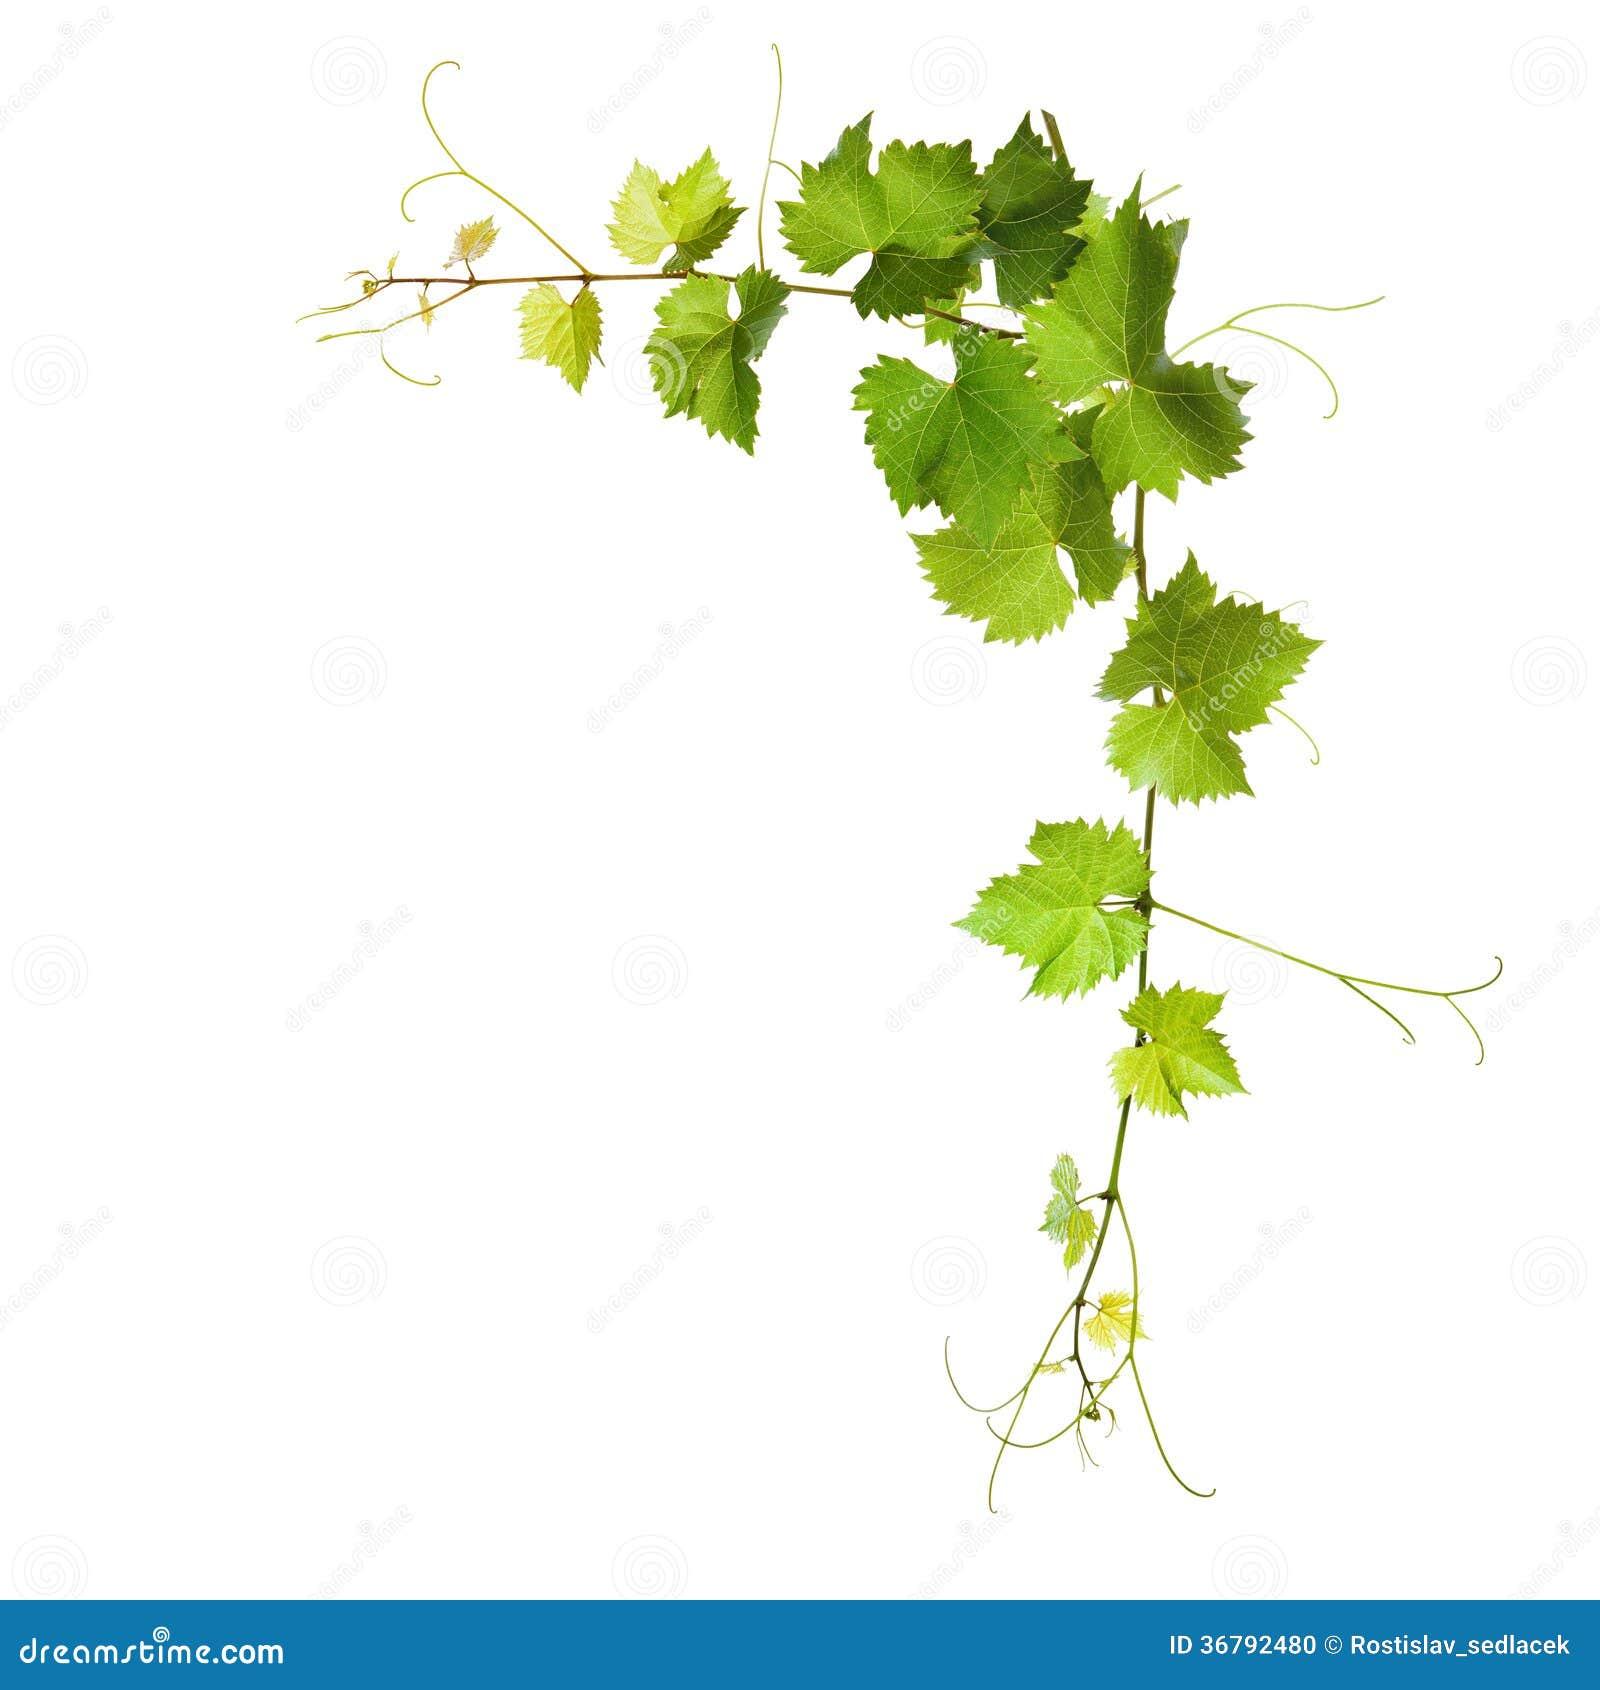 how to prepare vine leaves